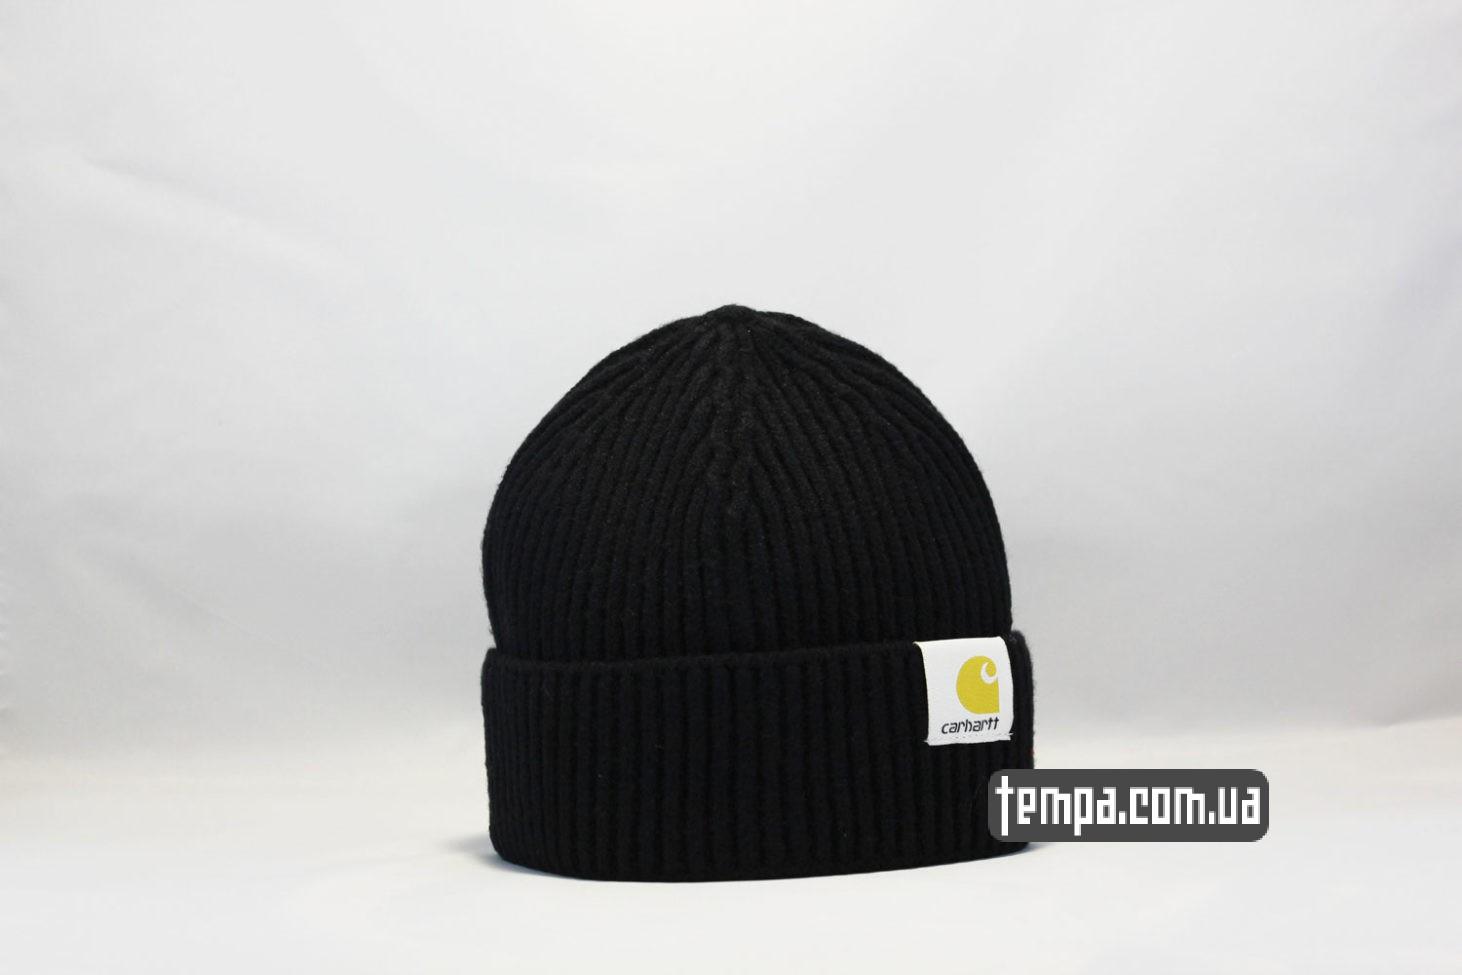 шапка beanie Carhartt черная купить Украина